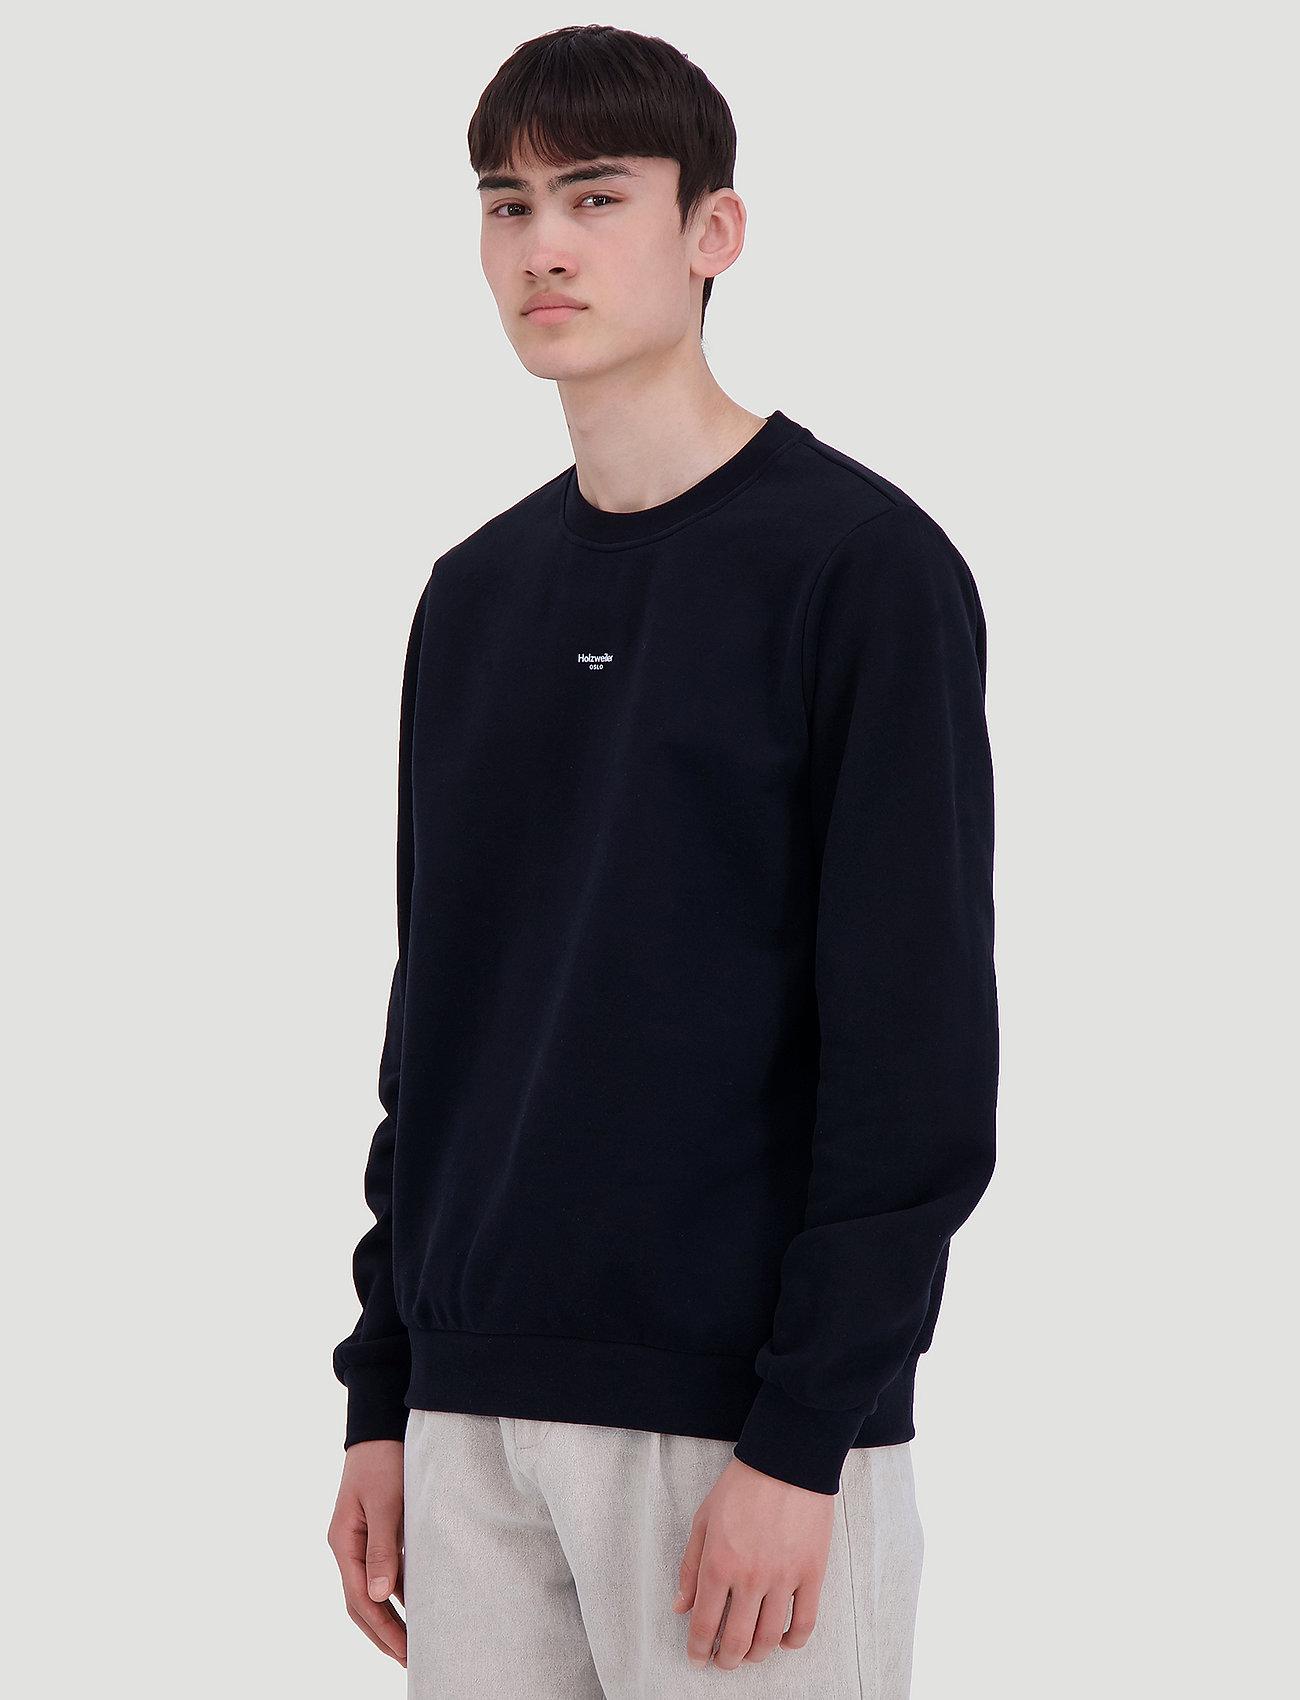 HOLZWEILER M Oslo Sweat - Sweatshirts BLACK - Menn Klær